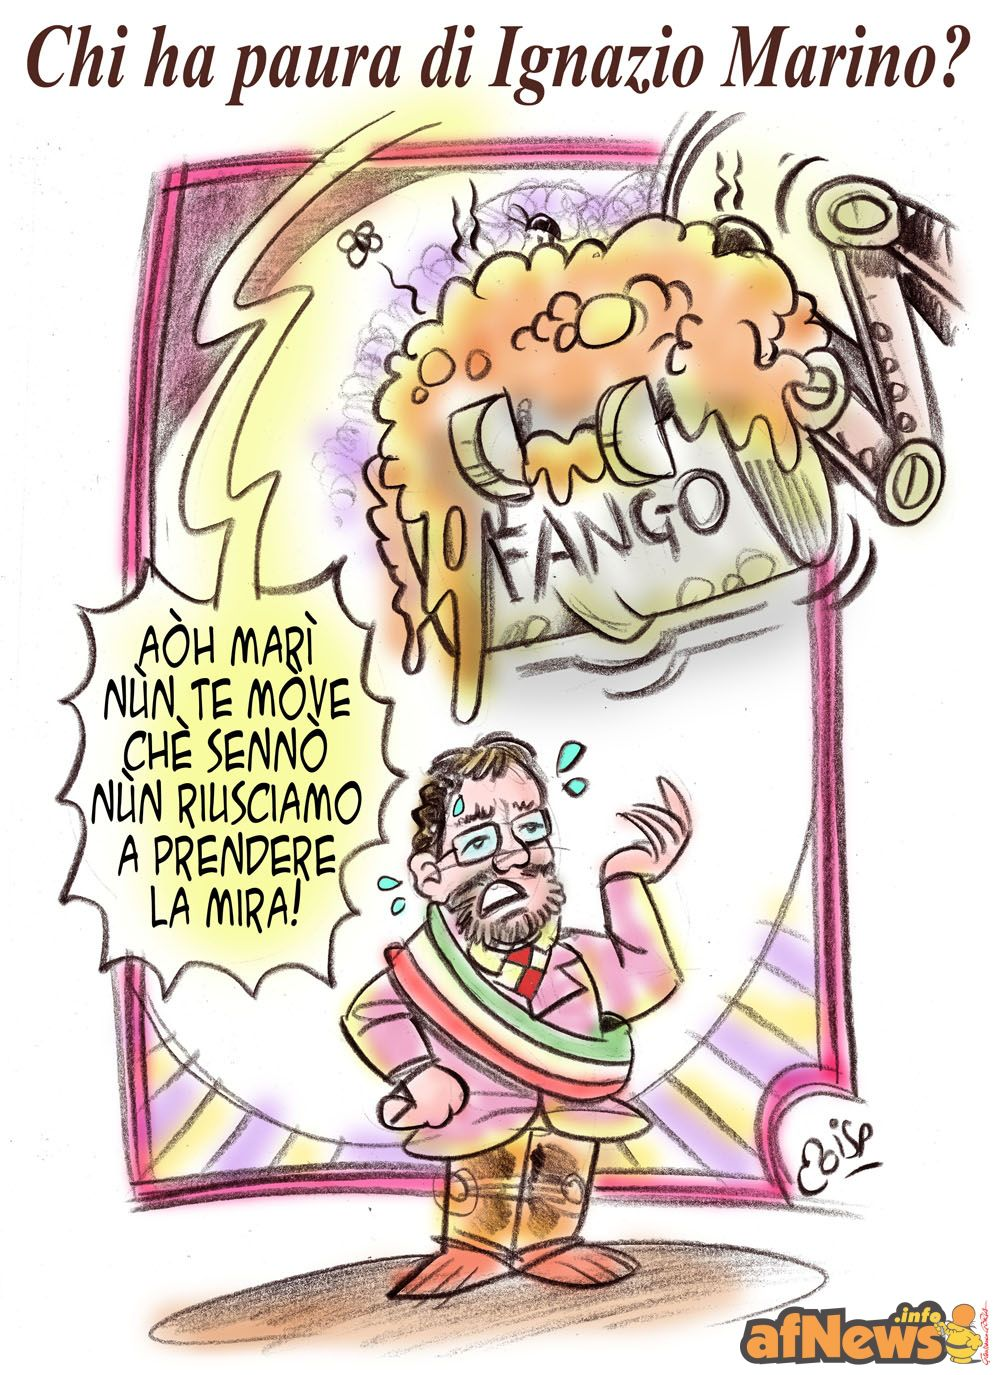 Fango Marino - http://www.afnews.info/wordpress/2015/10/08/fango-marino/